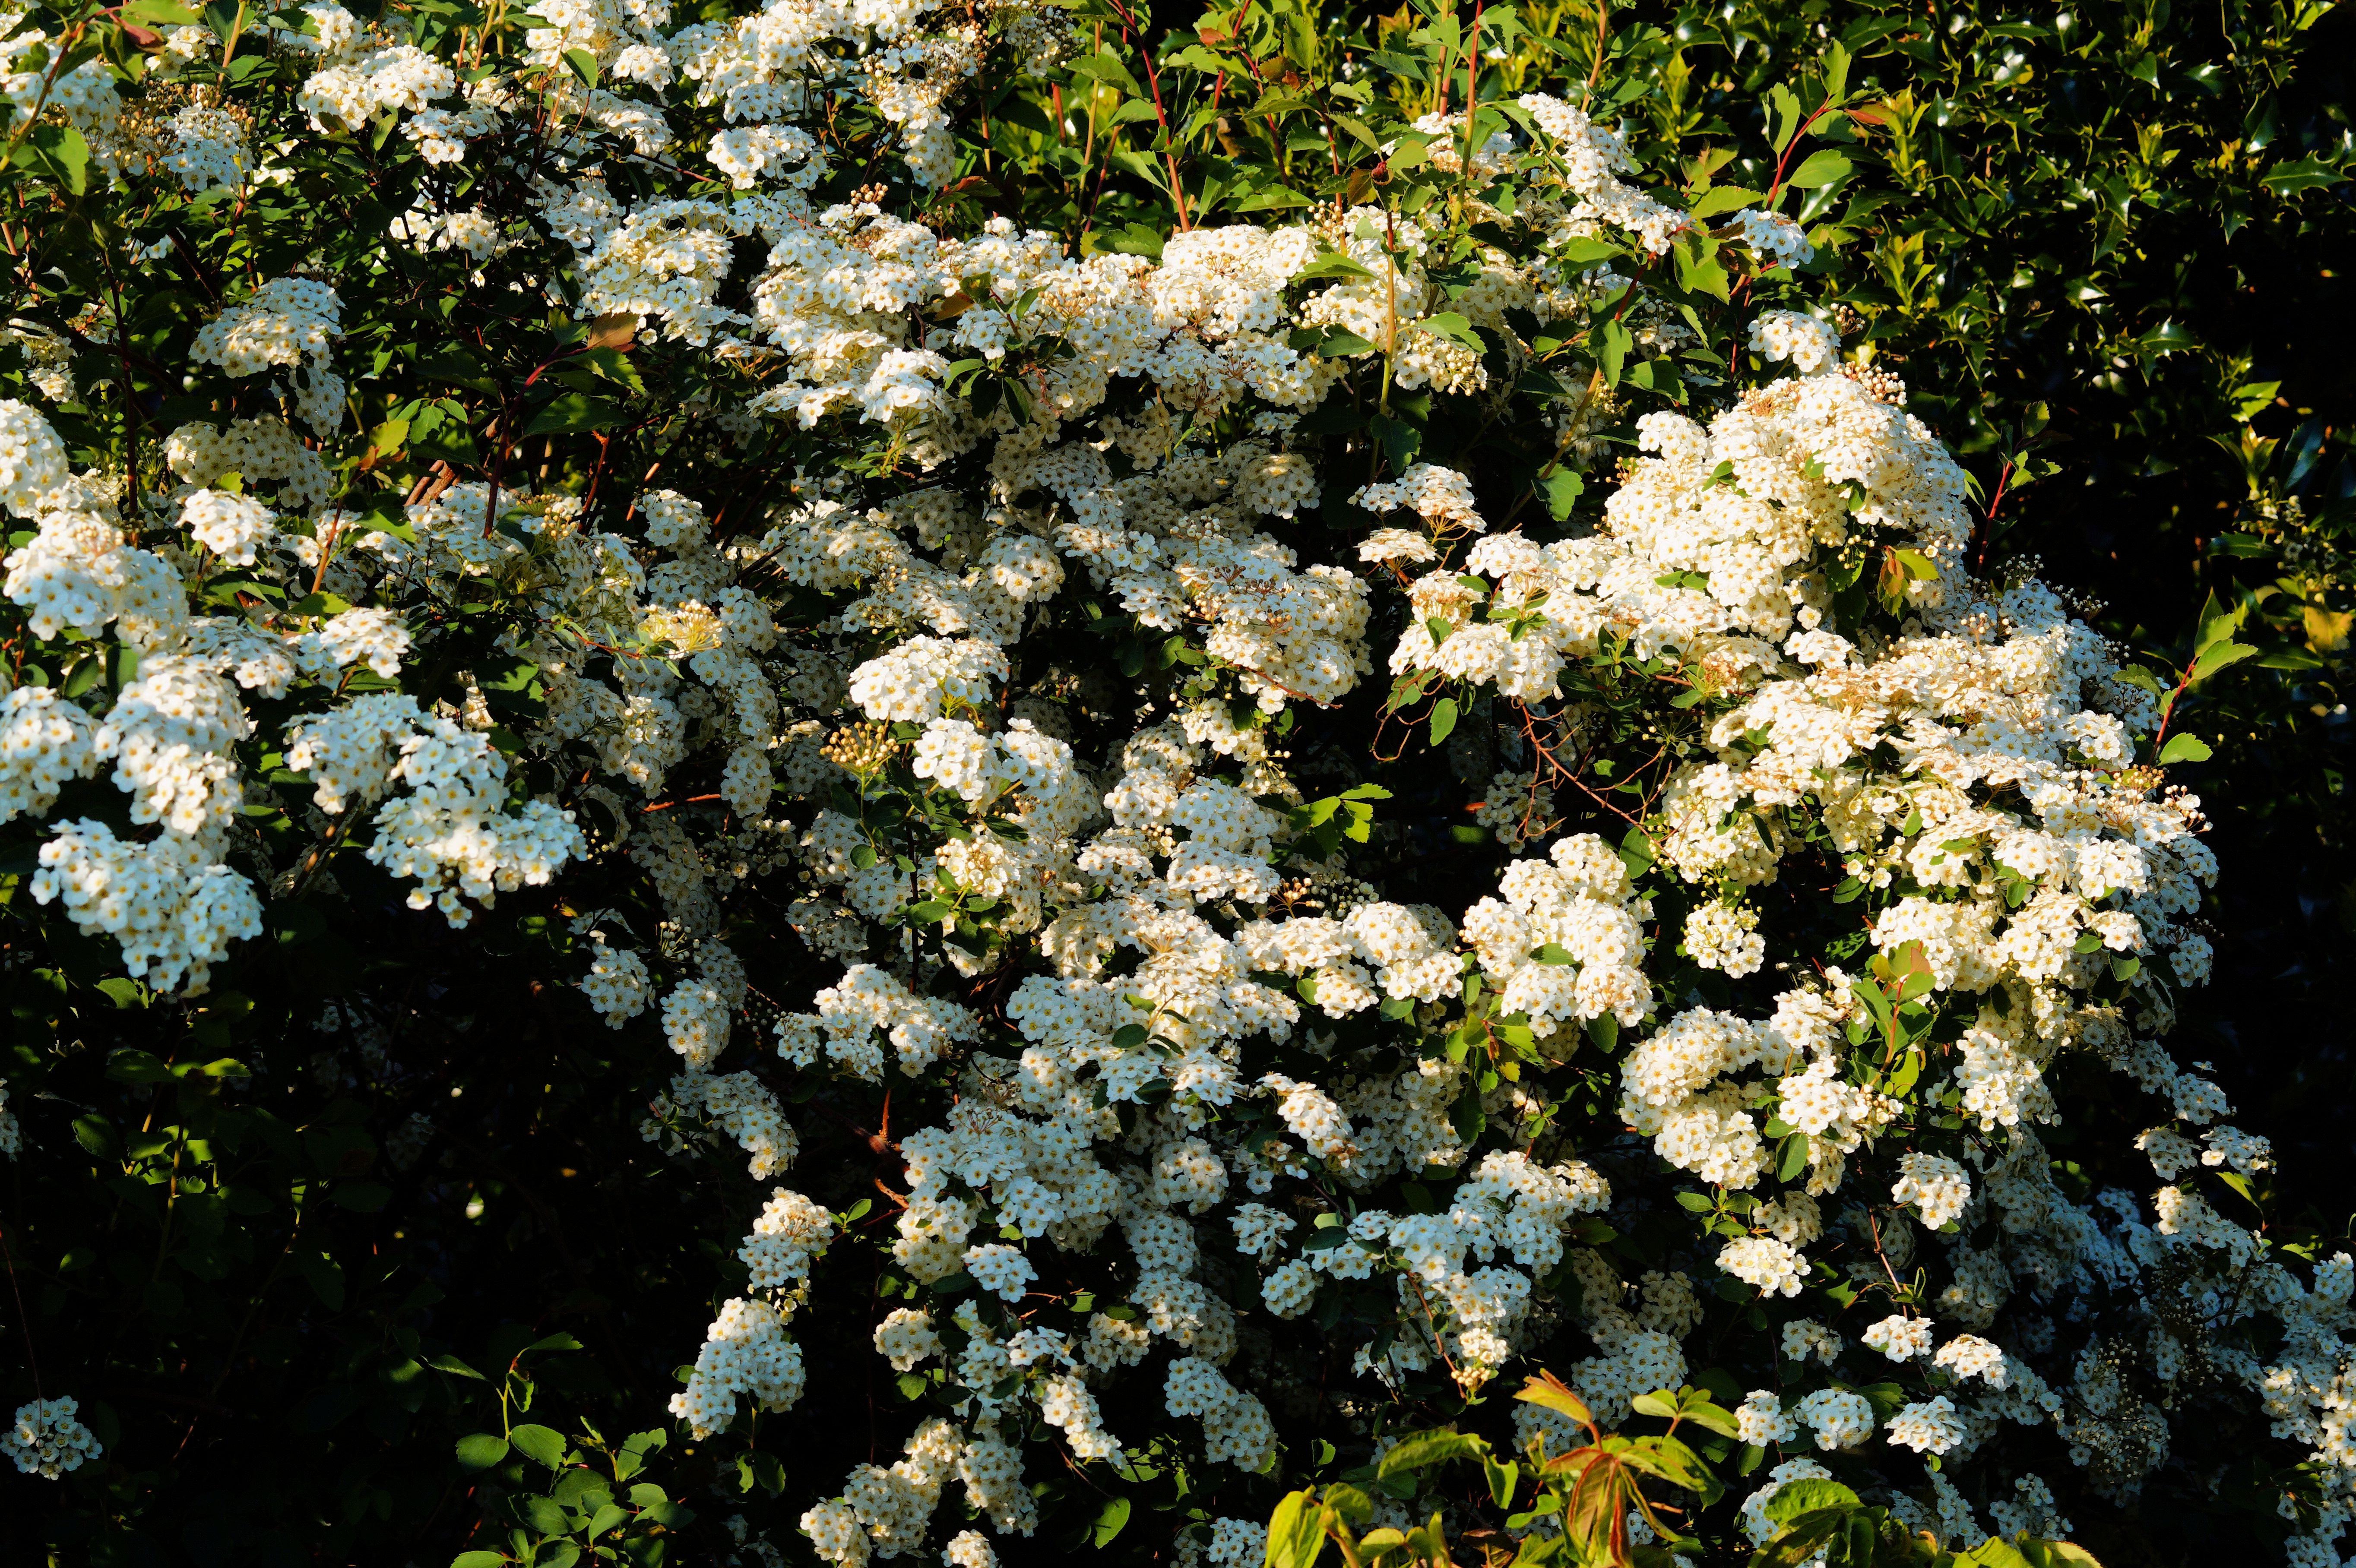 Free Images Blossom Flower Bush Spring Grow Botany Garden